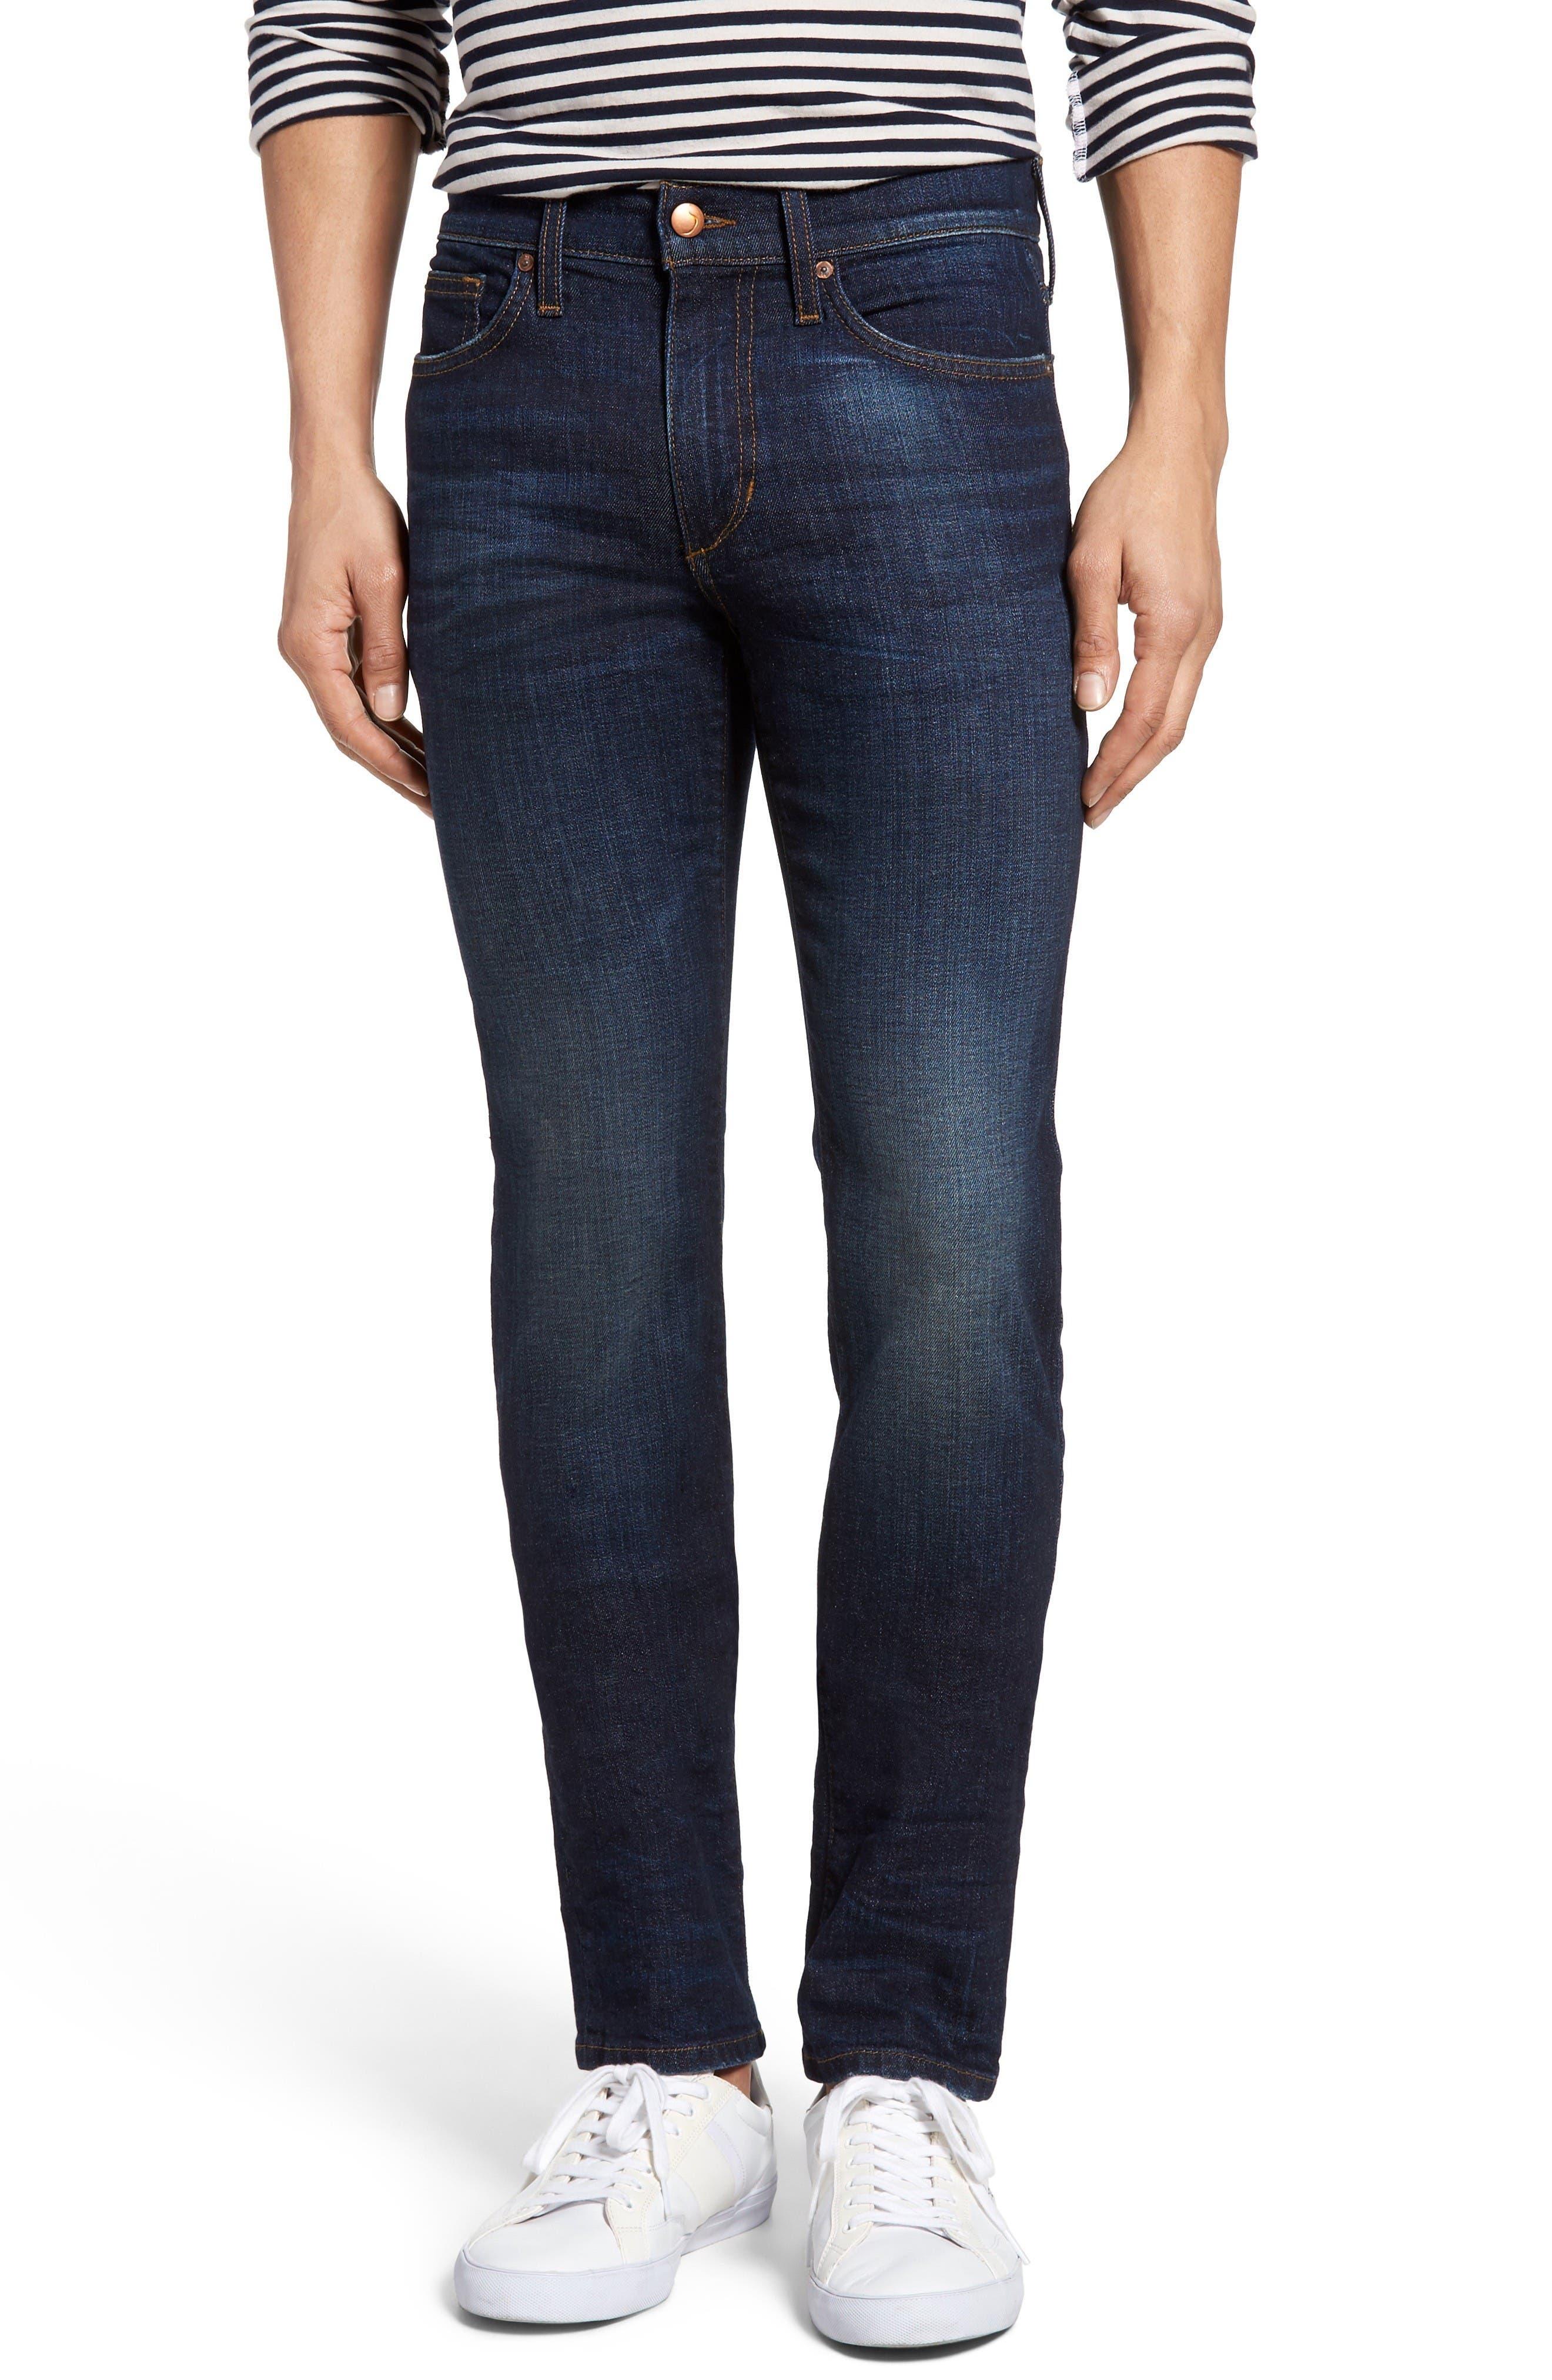 JOES Classic Straight Leg Jeans